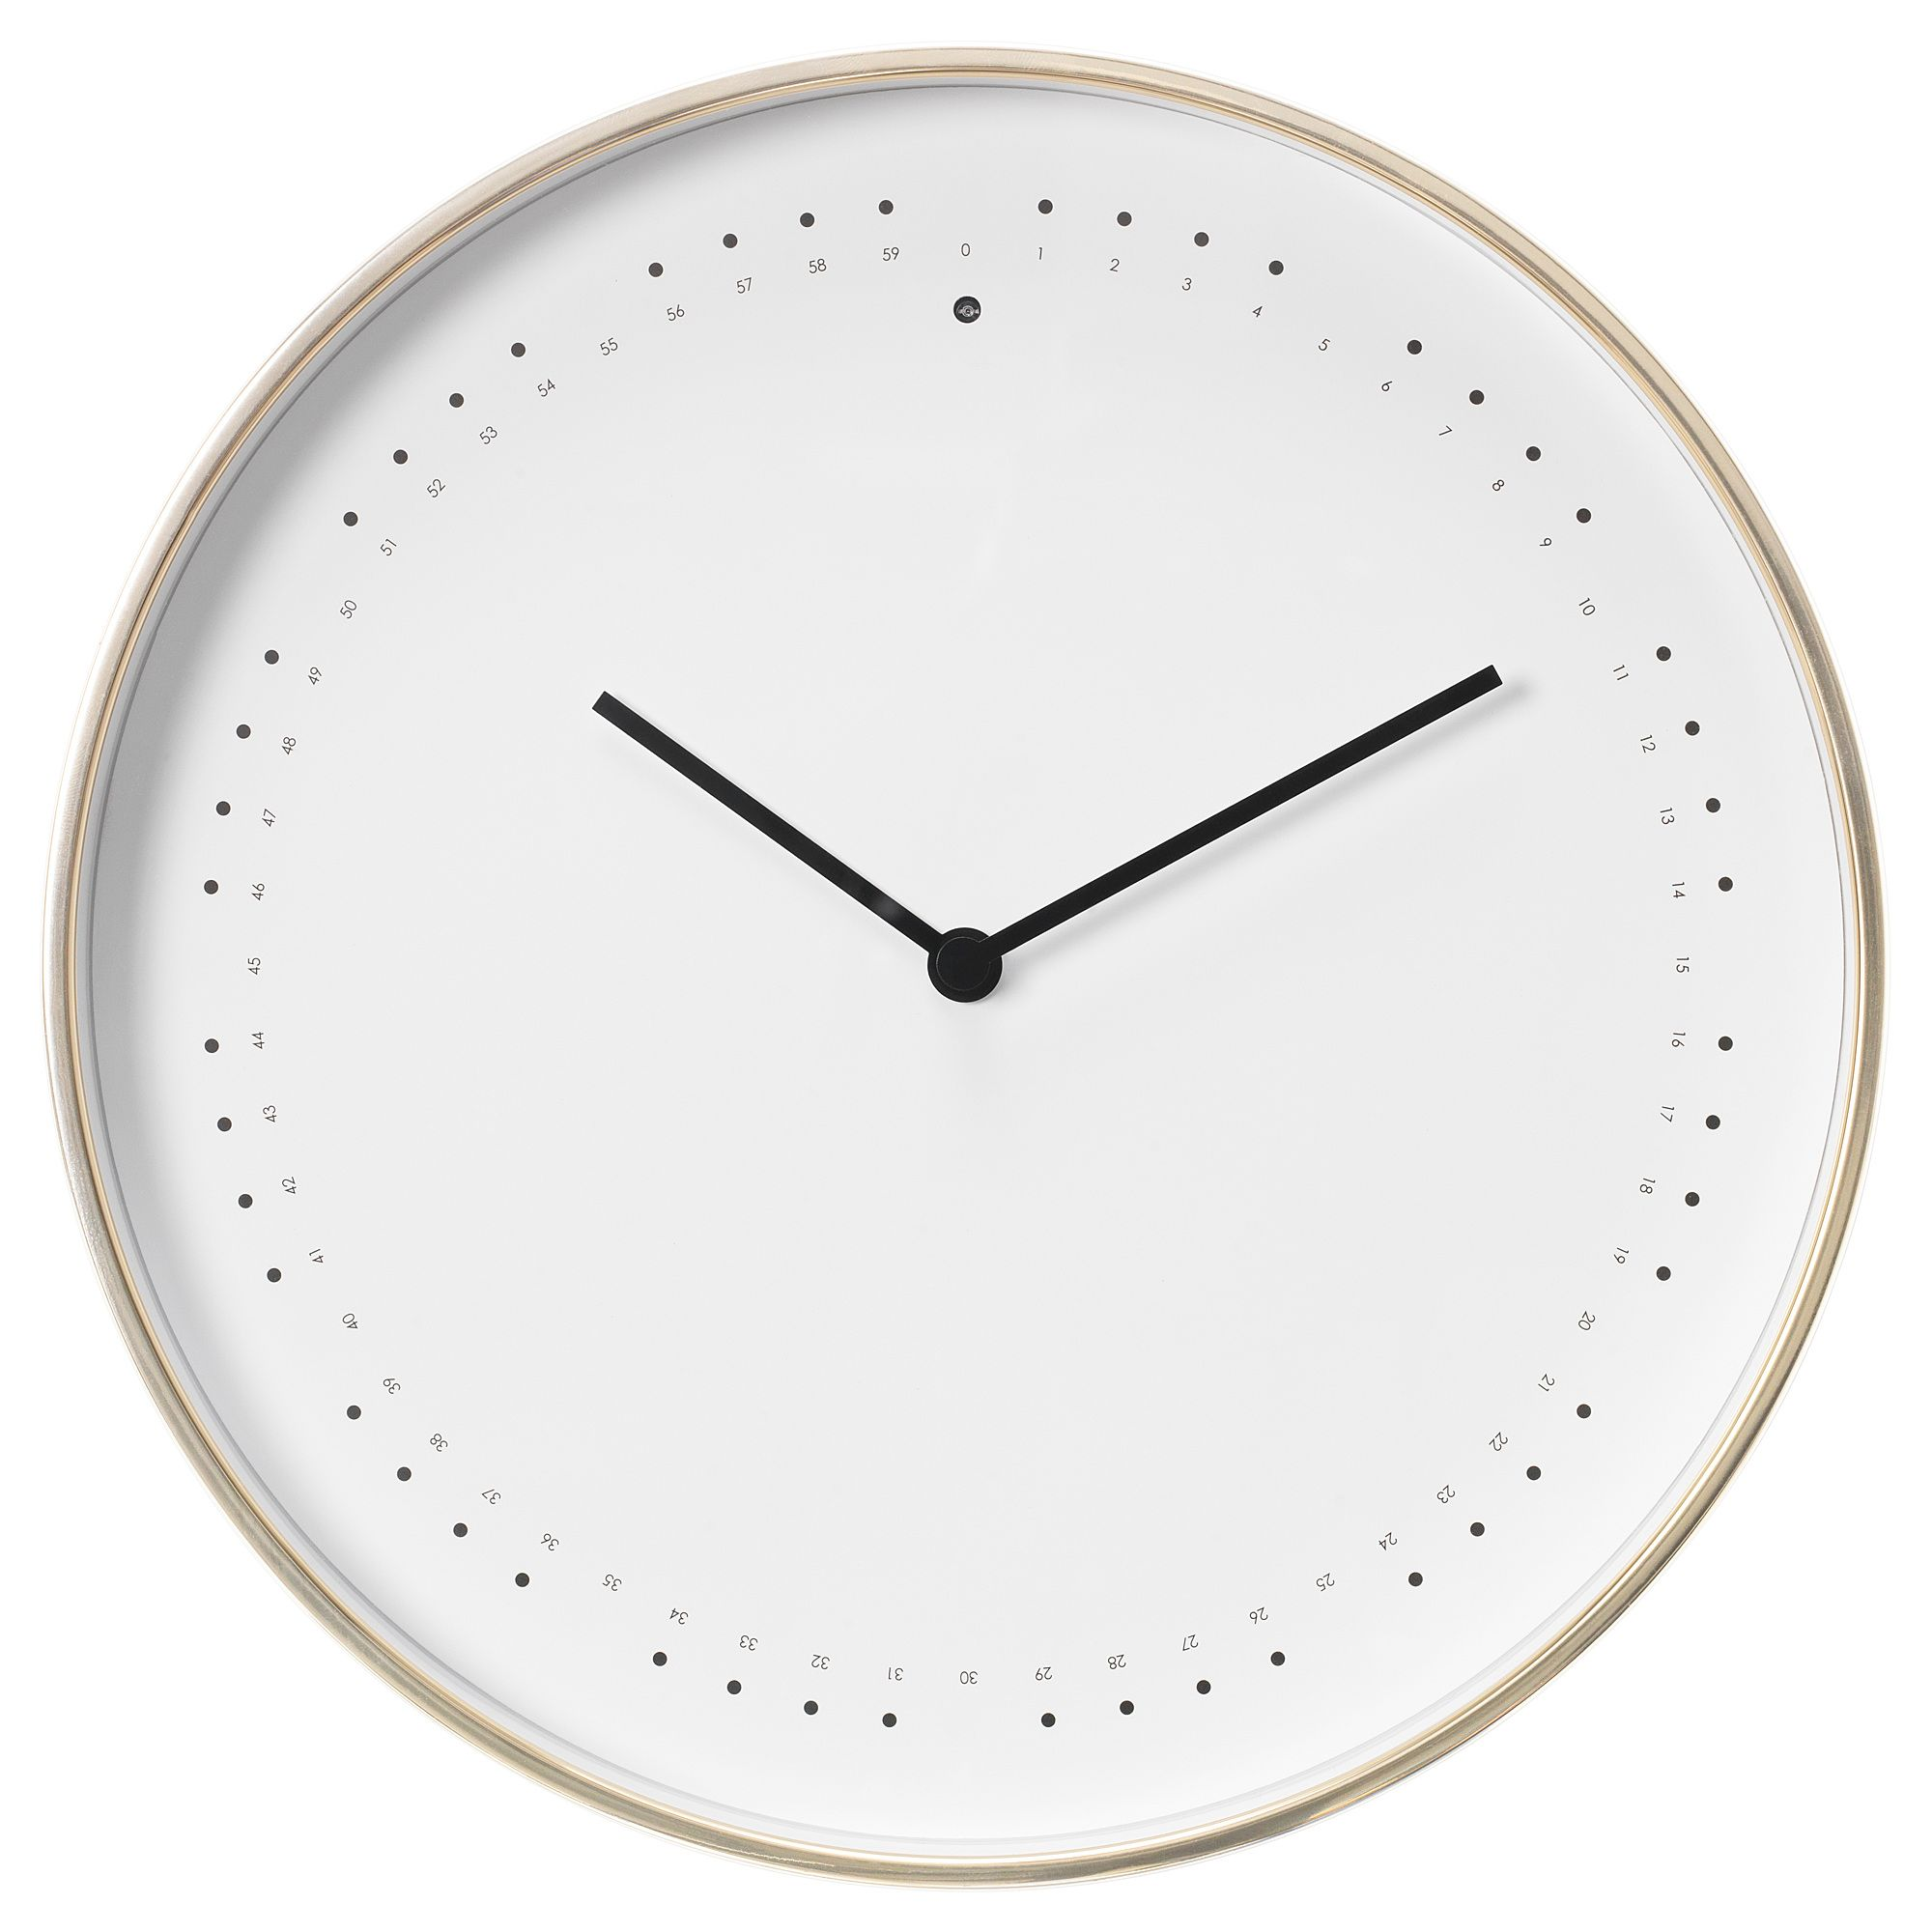 Panorera Wall Clock My Dream Bedroom Pinterest Wall Clocks